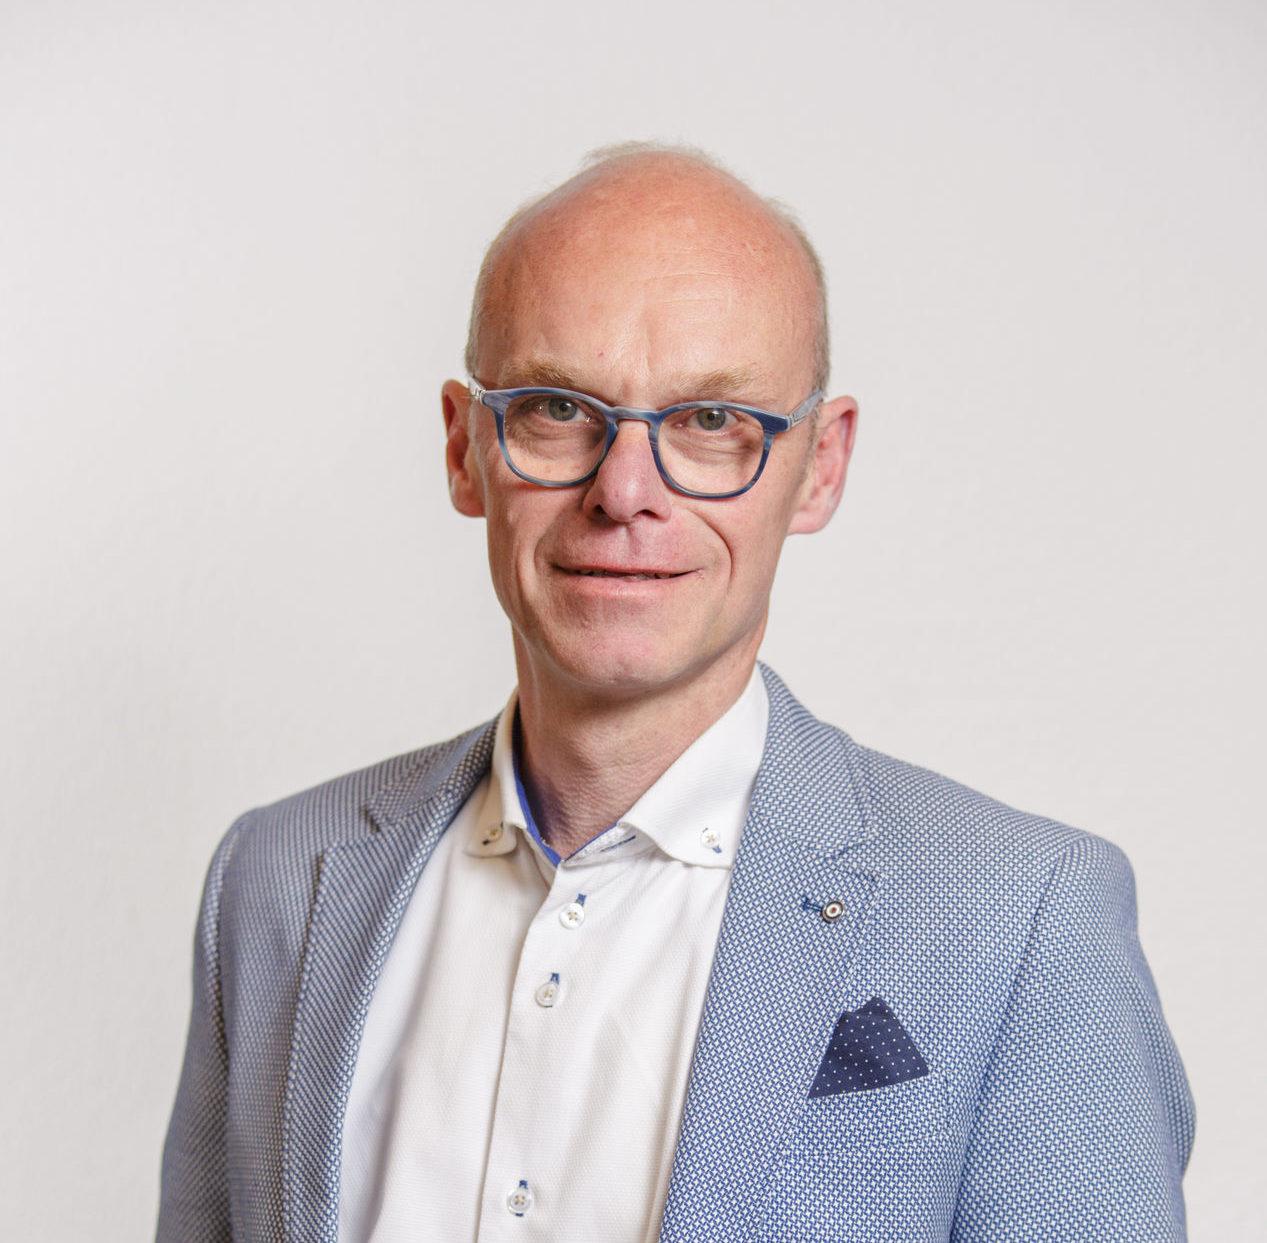 Goed LinkedInbericht Maurits Dekker - Kwaliteitsadviseur in de zorg